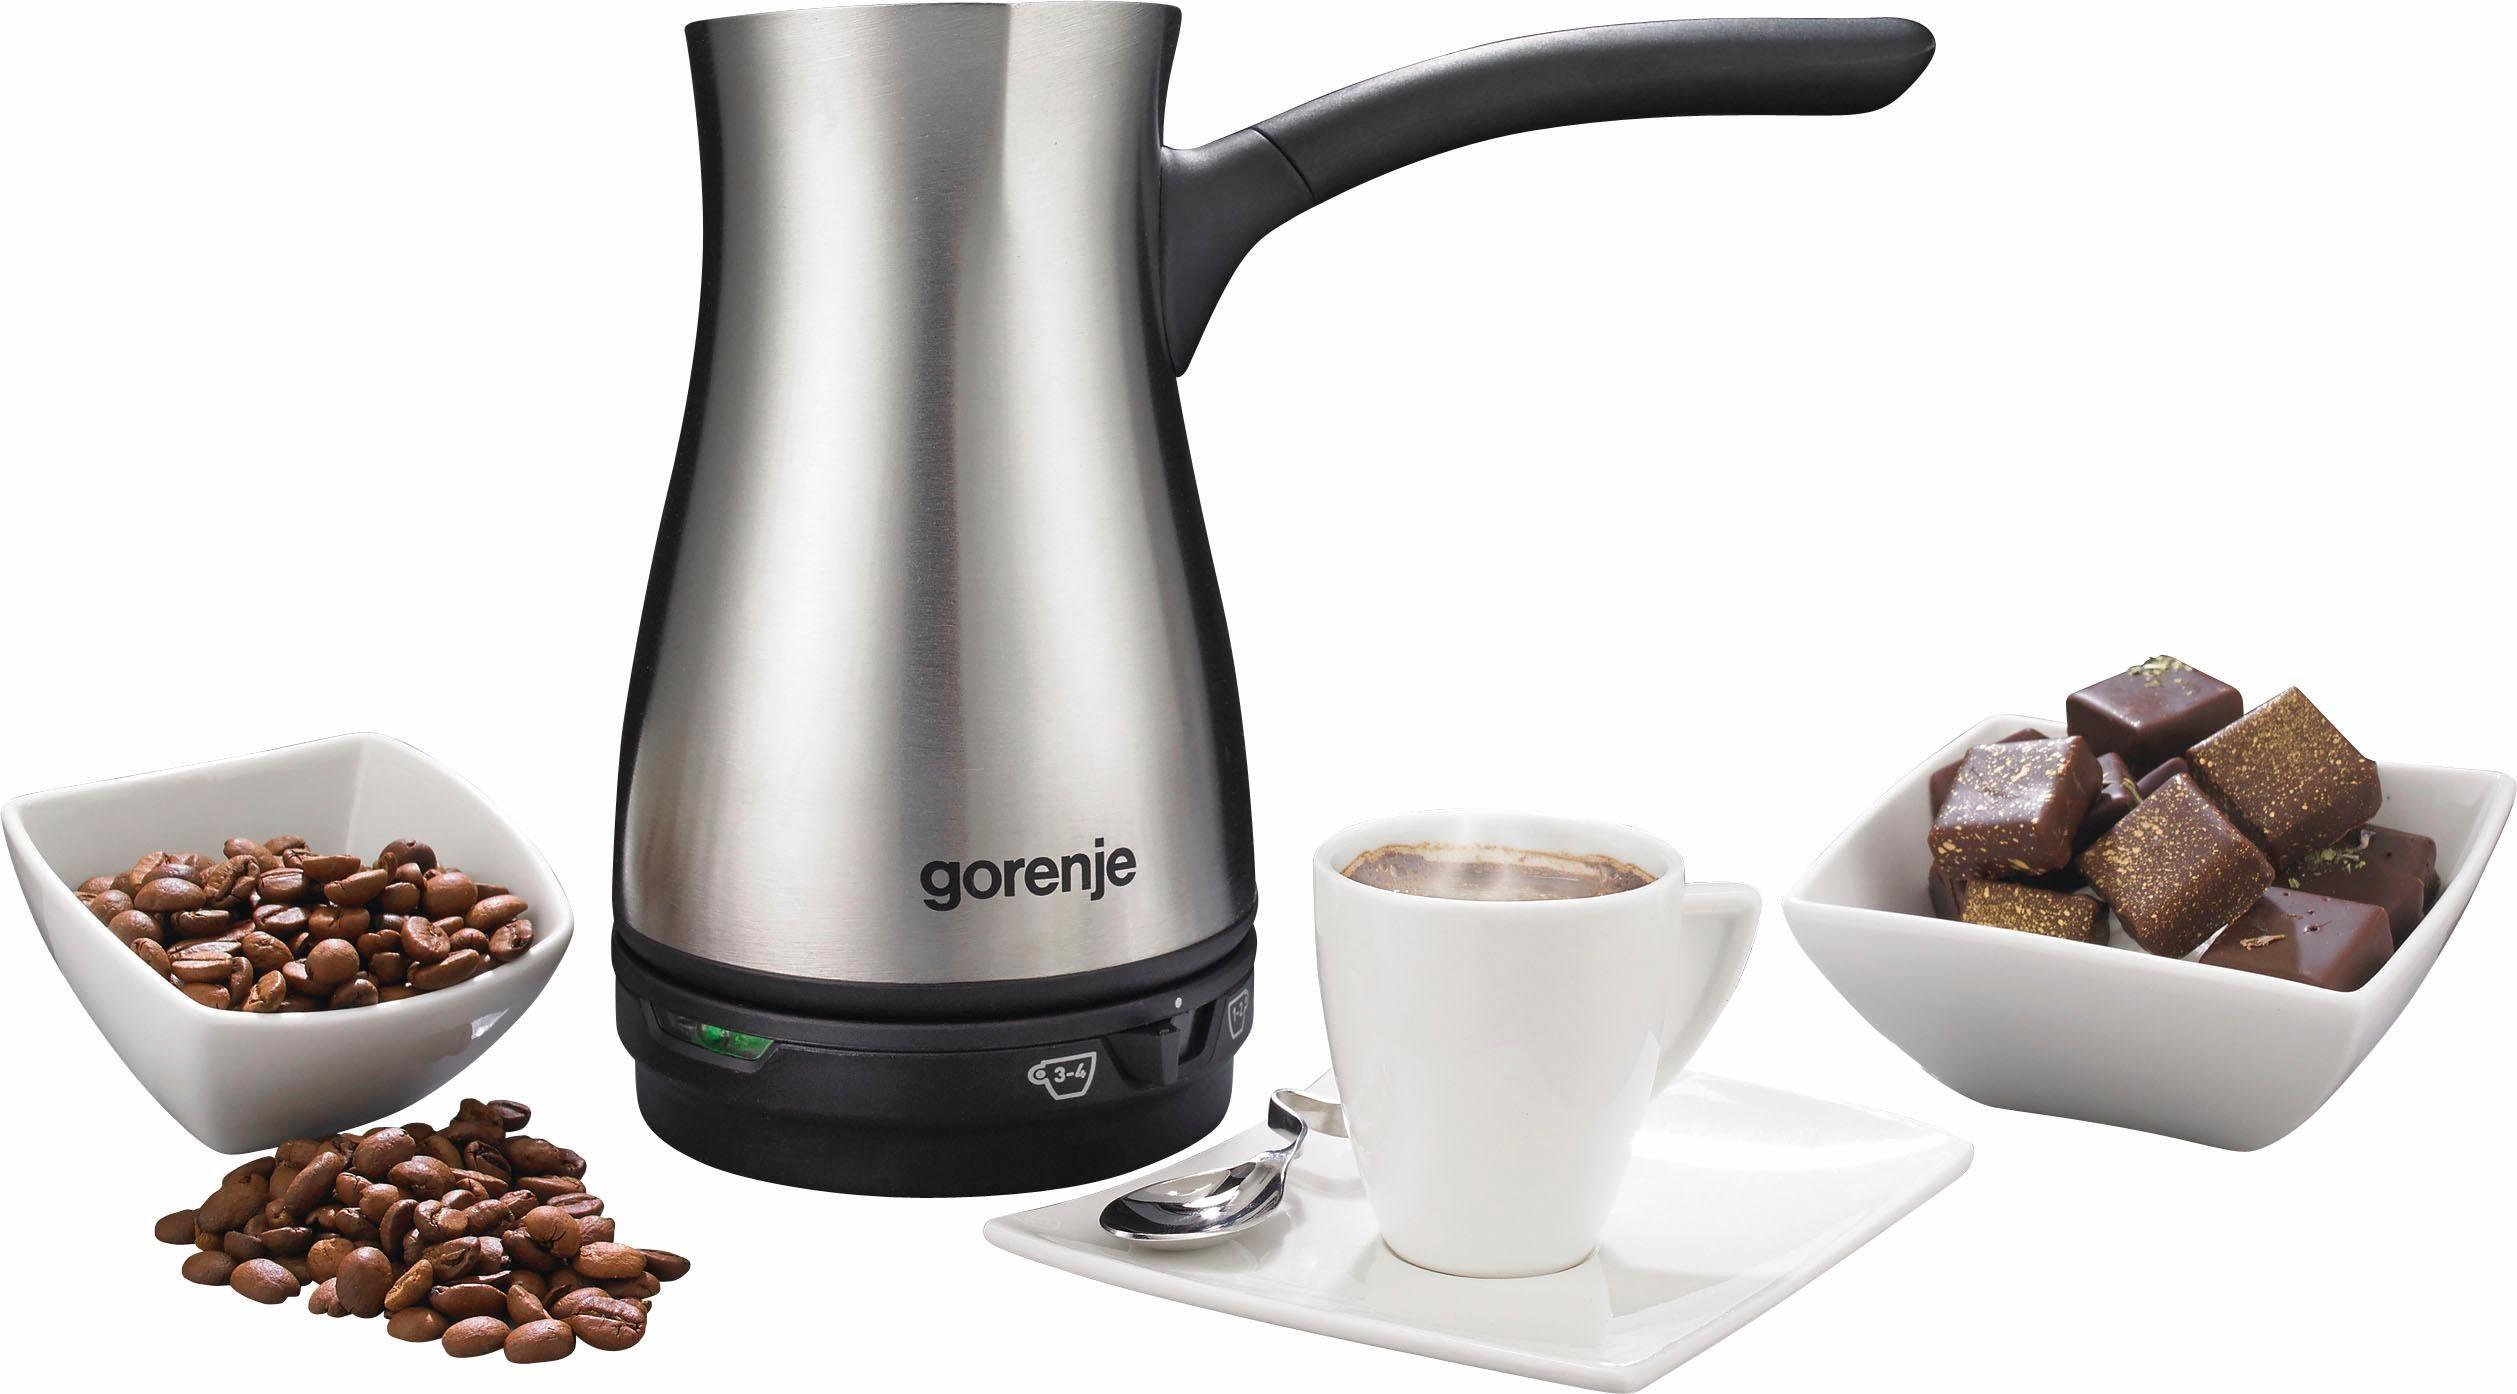 GORENJE Espressokocher TCM800E, 0,3l Kaffeekanne, Türkischer Kaffeebereiter